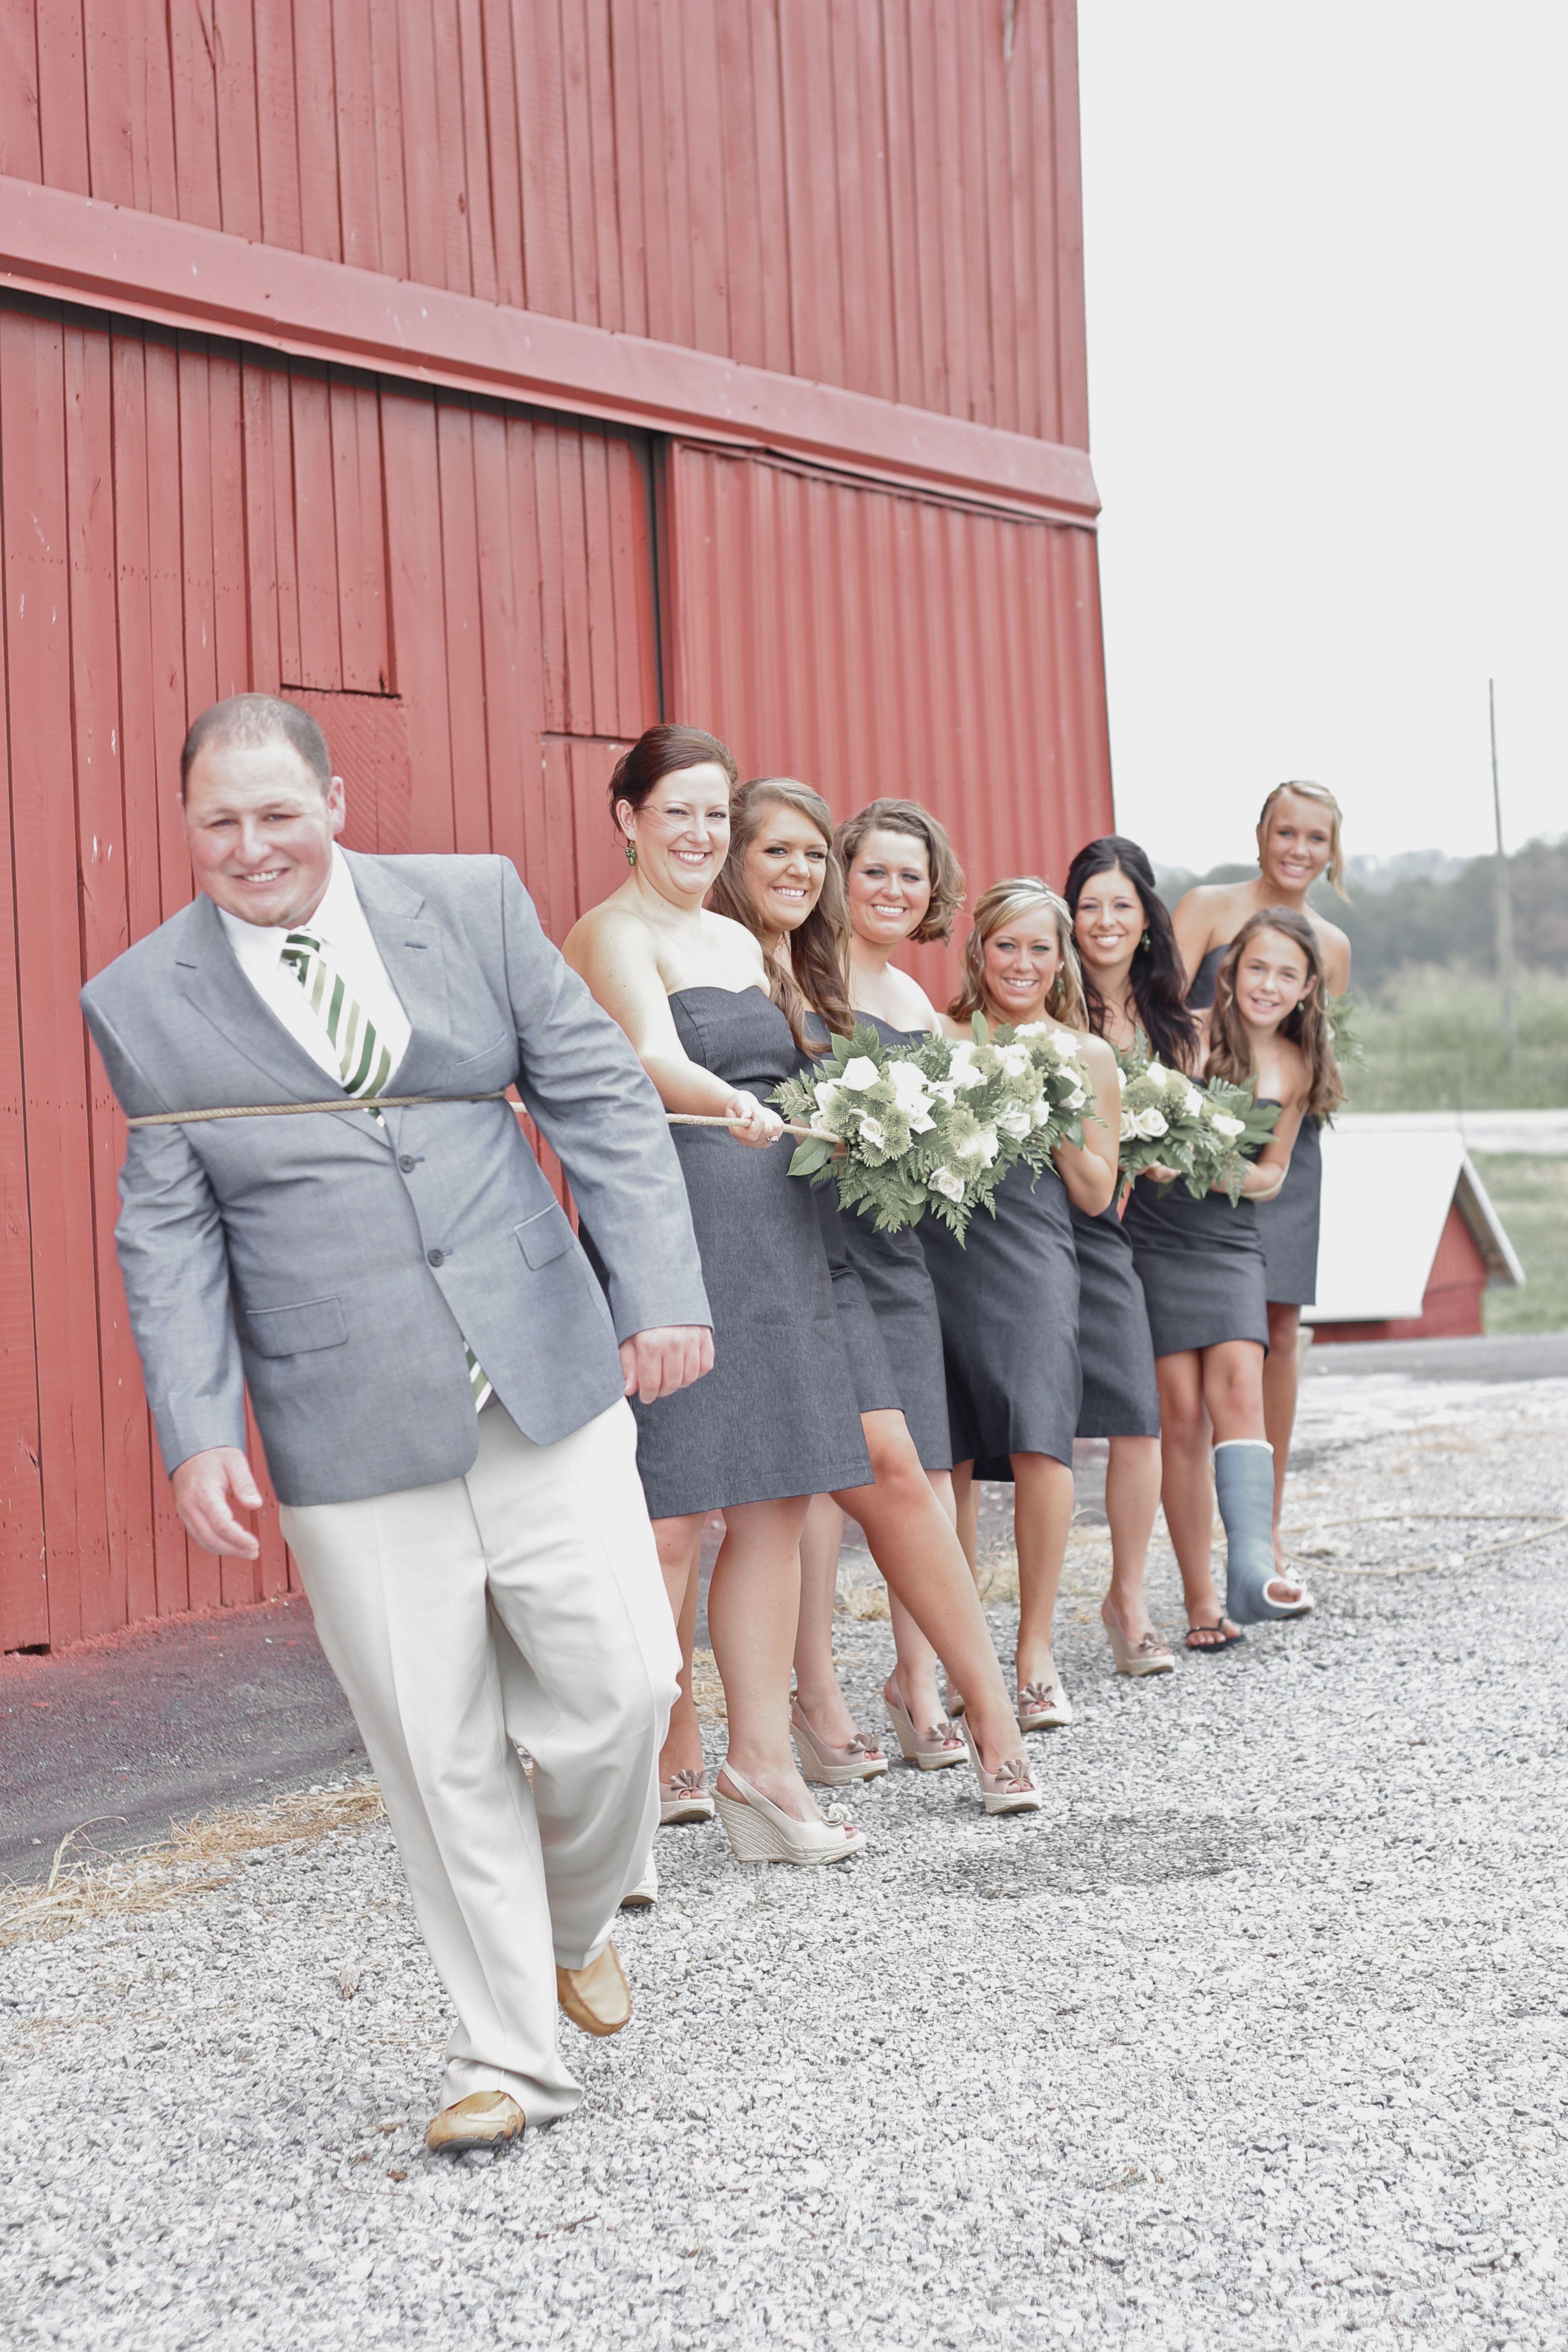 practical/casual wedding attire